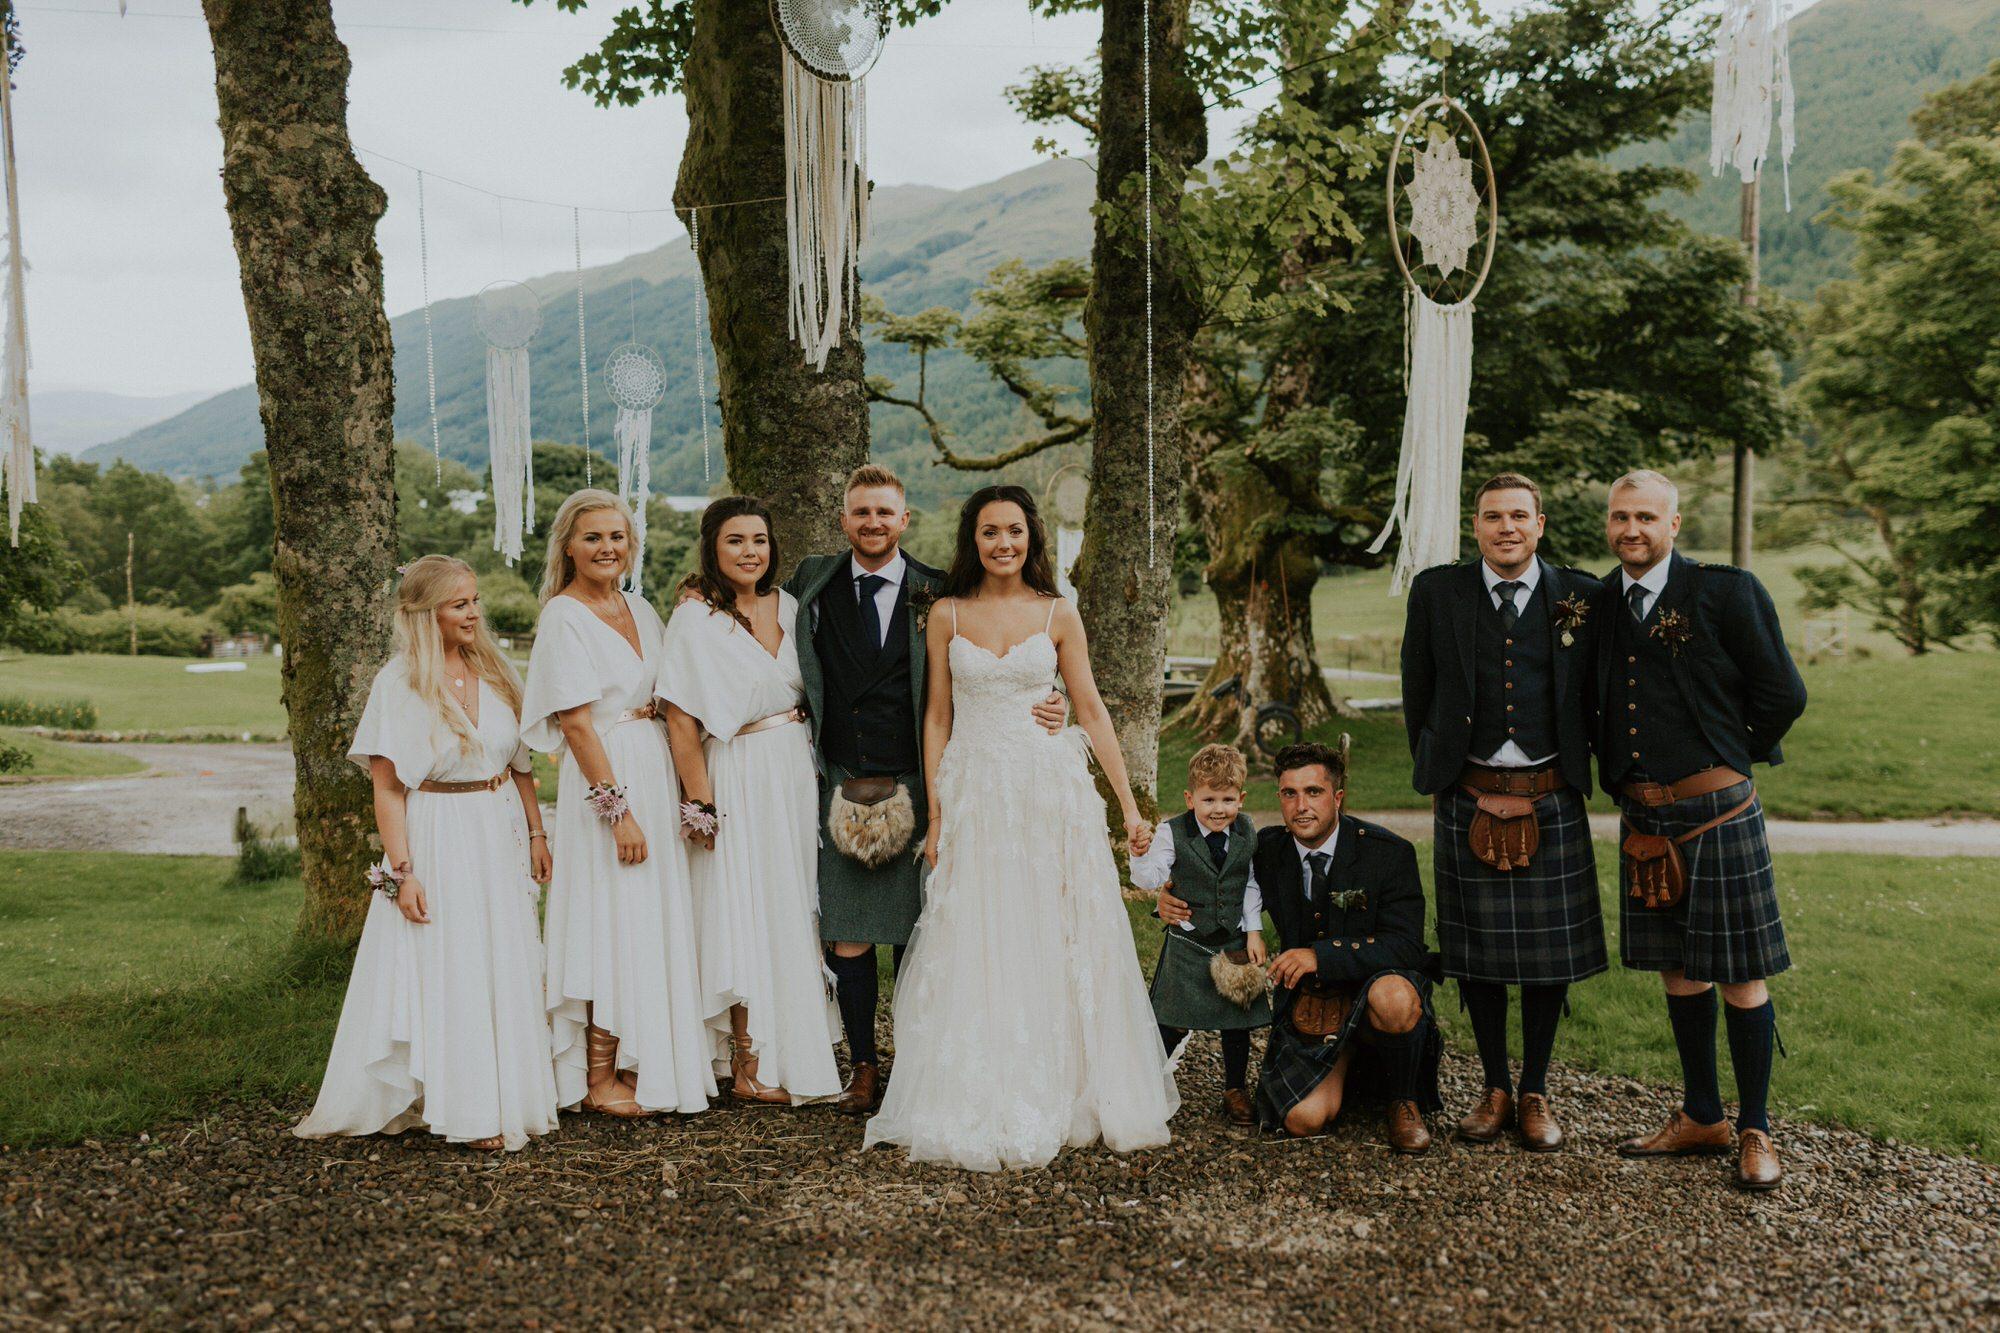 9de962d1a8c4a Dreamcatchers and Bohemian Vibes for a Free Spirited Scottish Lochside  Wedding | Love My Dress® UK Wedding Blog + Wedding Directory